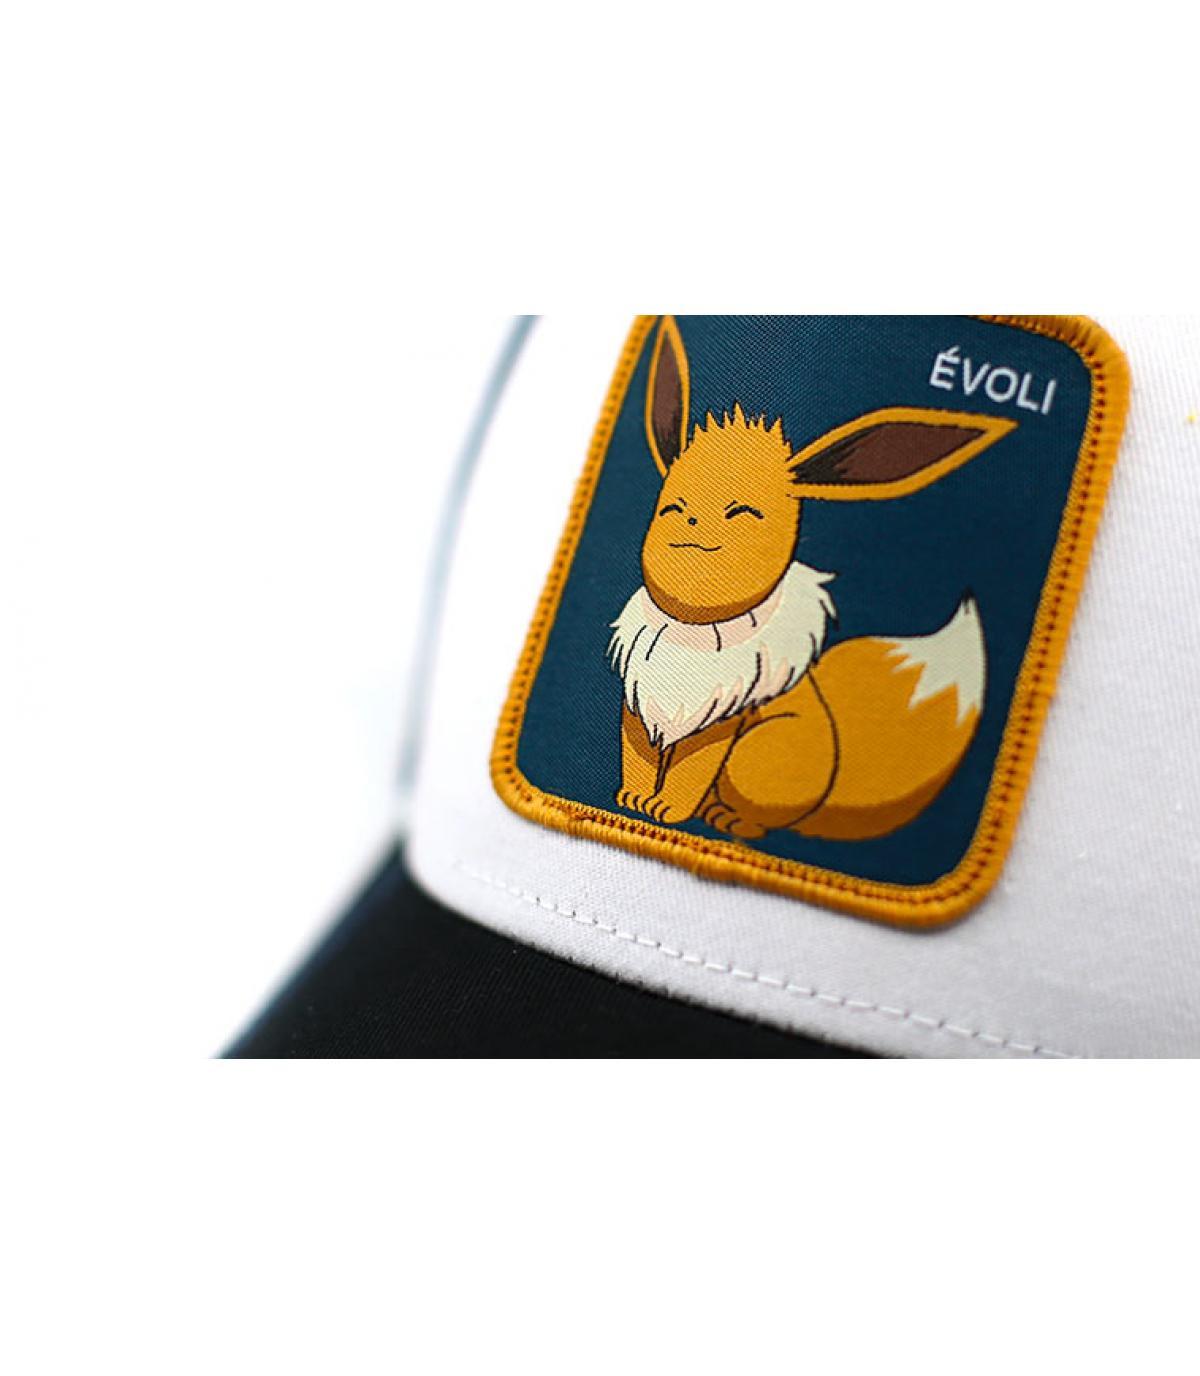 Détails Trucker Pokemon Evoli - image 3